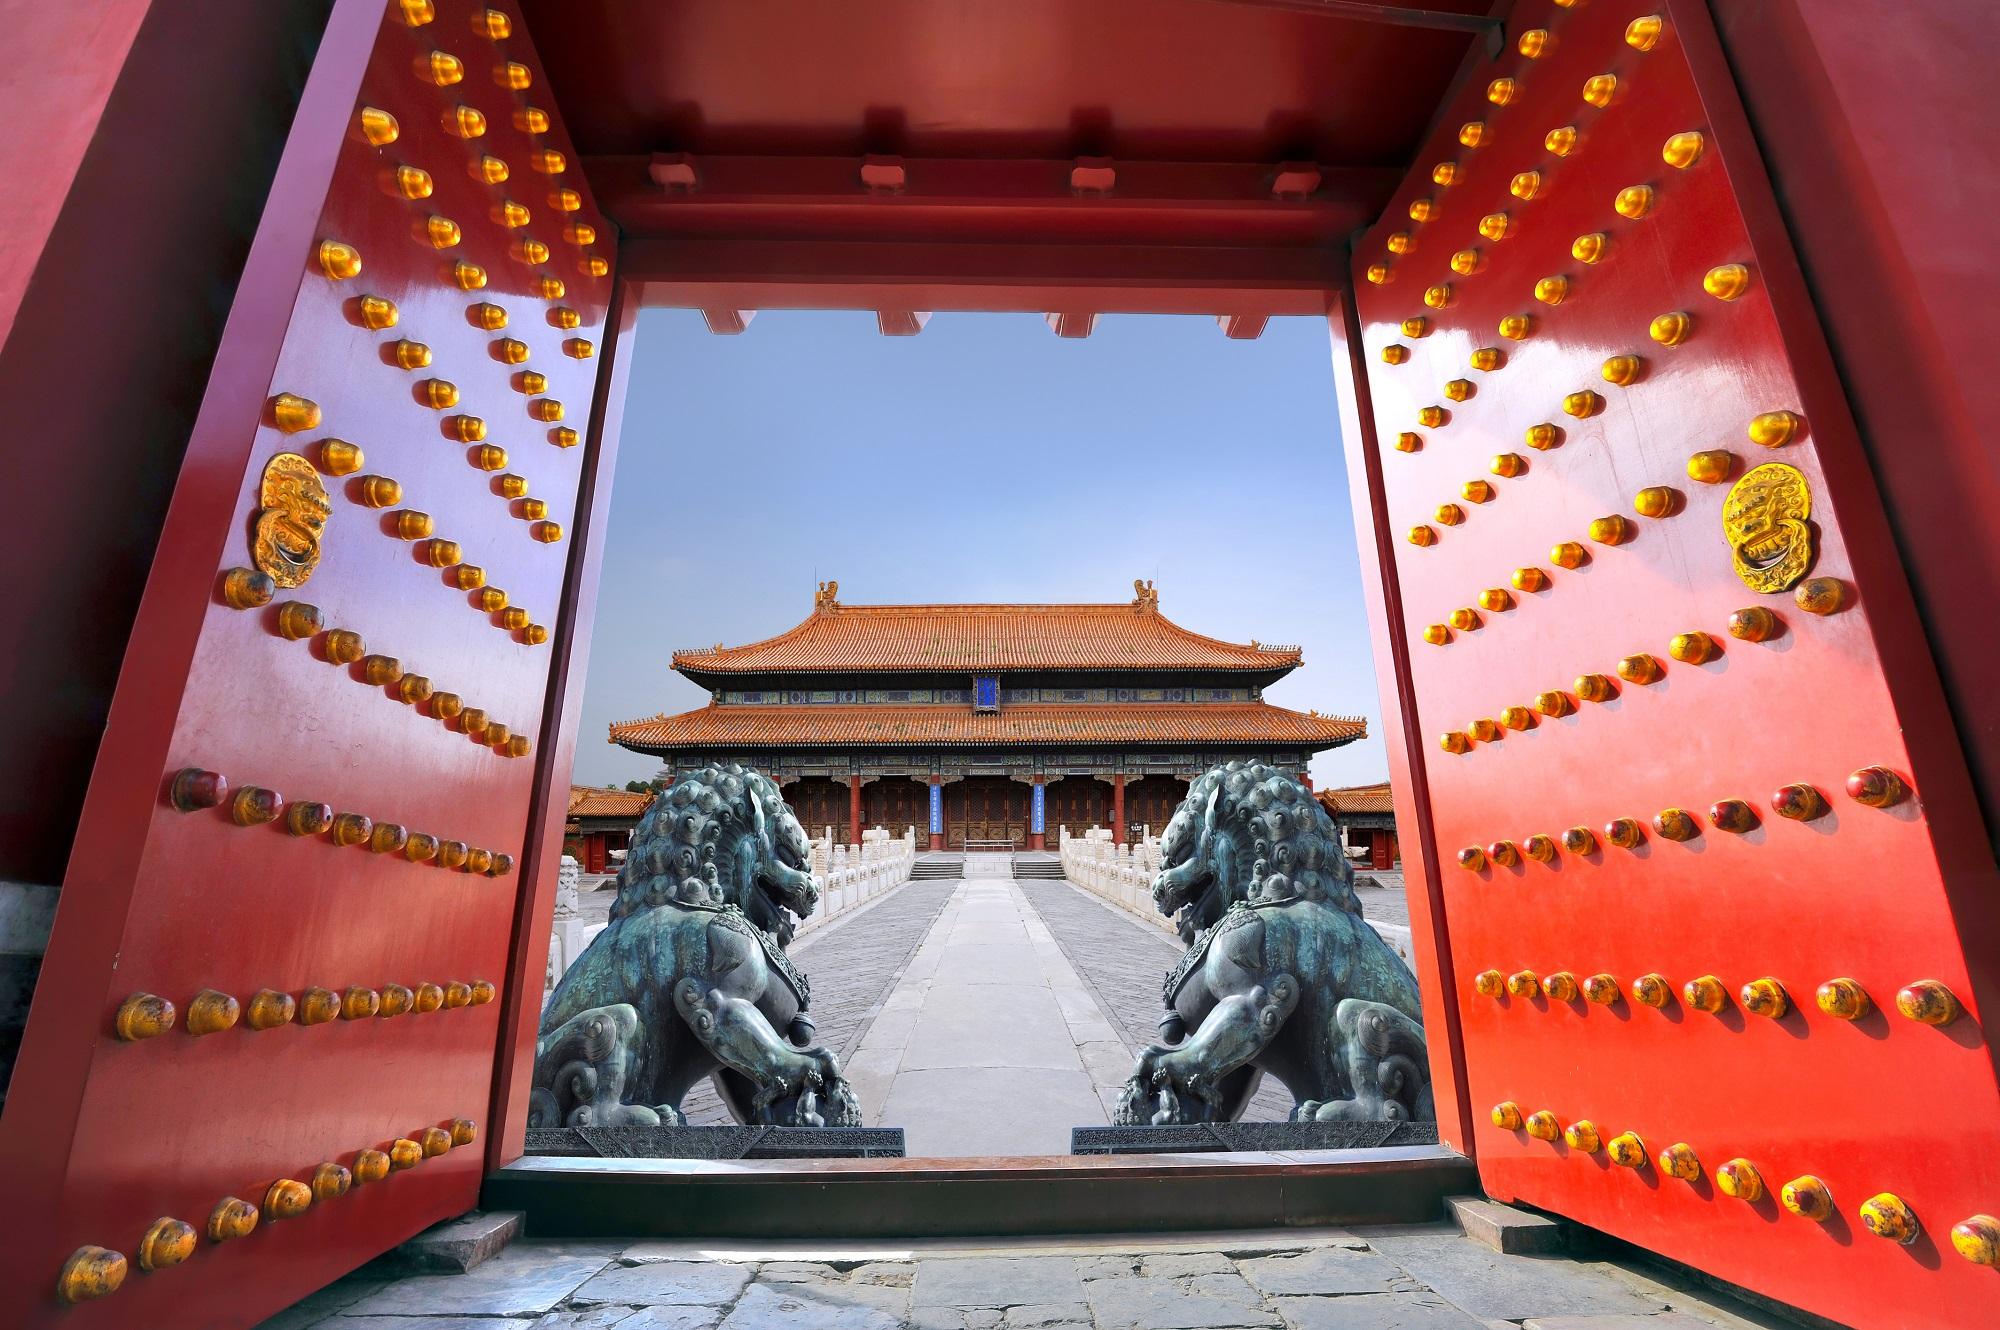 Puerta roja en China